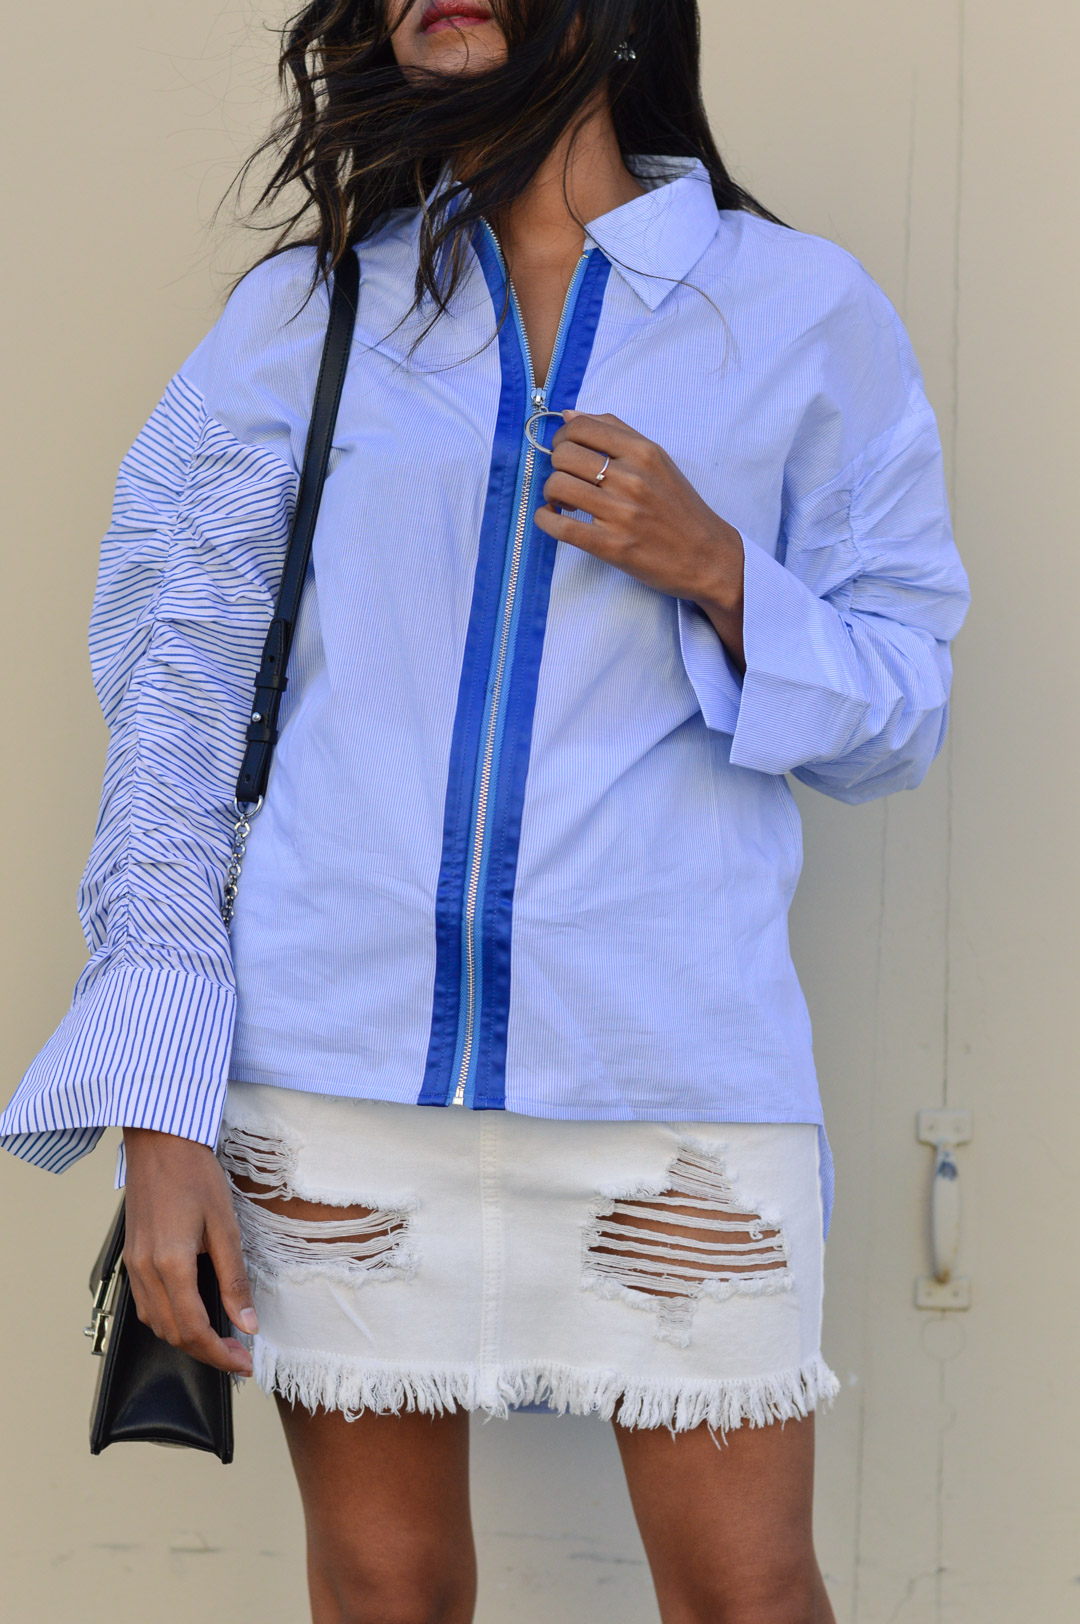 striped-buttondown-shirt-white-denim-skirt-fall-style 4